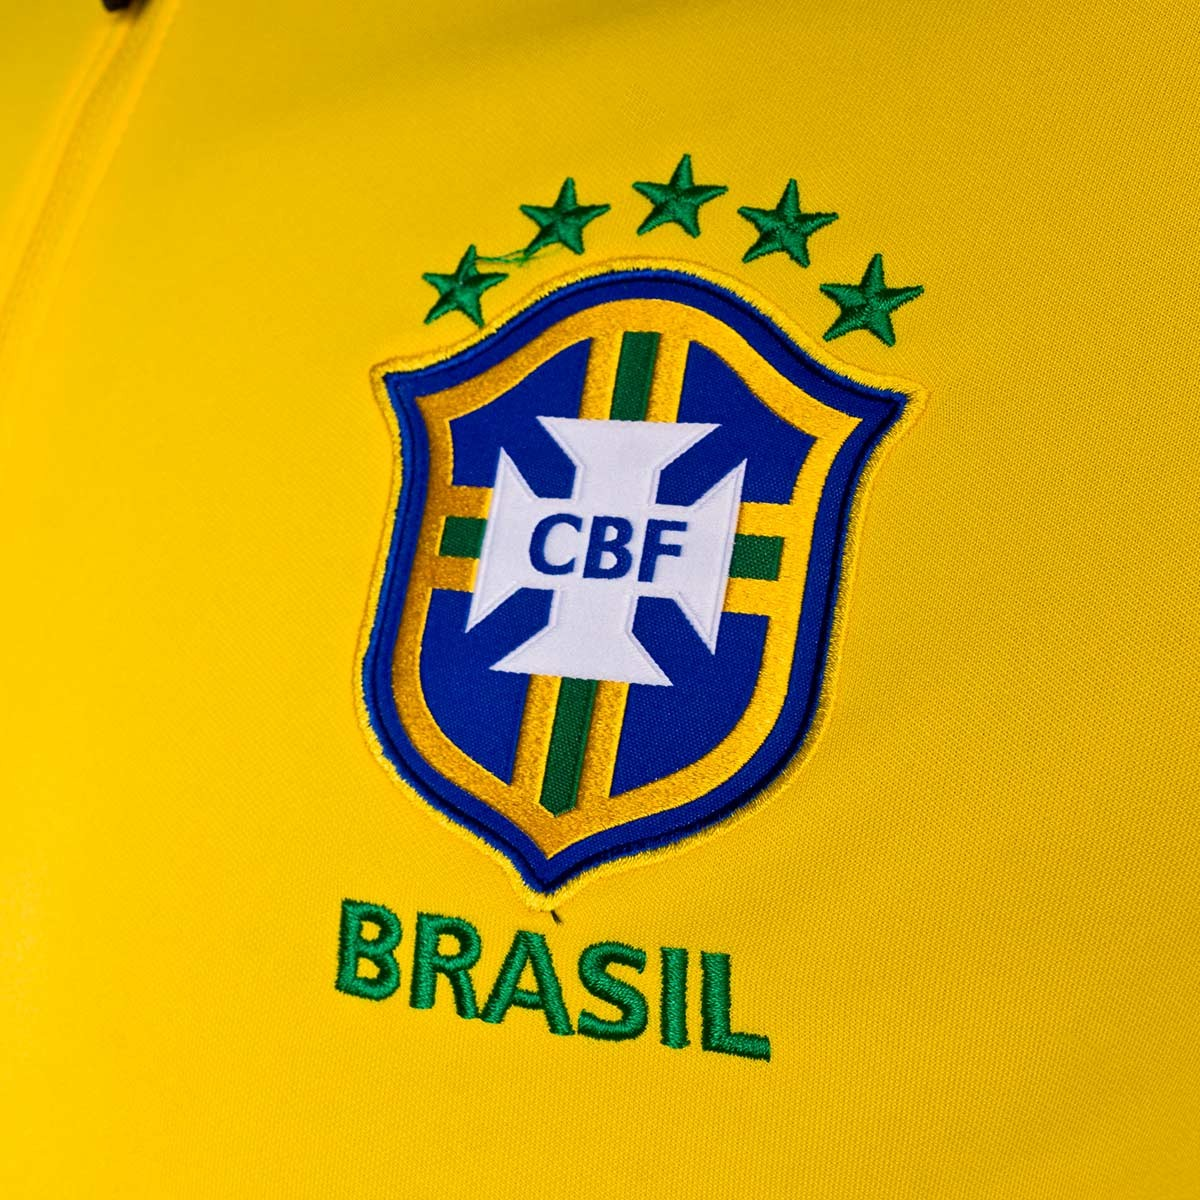 16e94f7a342 Jacket Nike Brazil Pre-Match 2018-2019 Midwest gold-Varsity maize-Lucky  green - Tienda de fútbol Fútbol Emotion